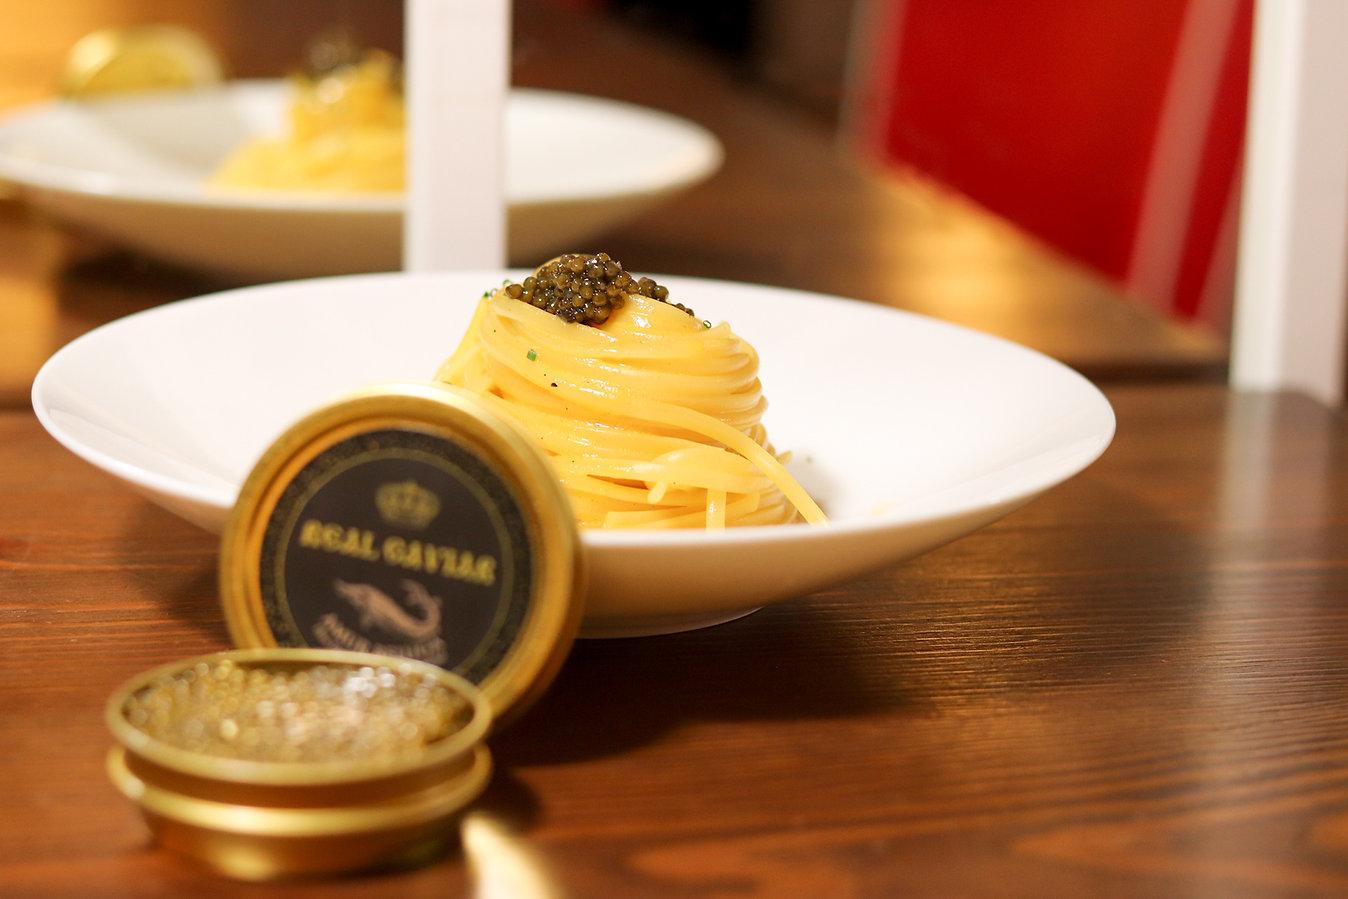 Premiata Forneria Ballarò y Real Caviar (Restaurantes) - GastroMadrid